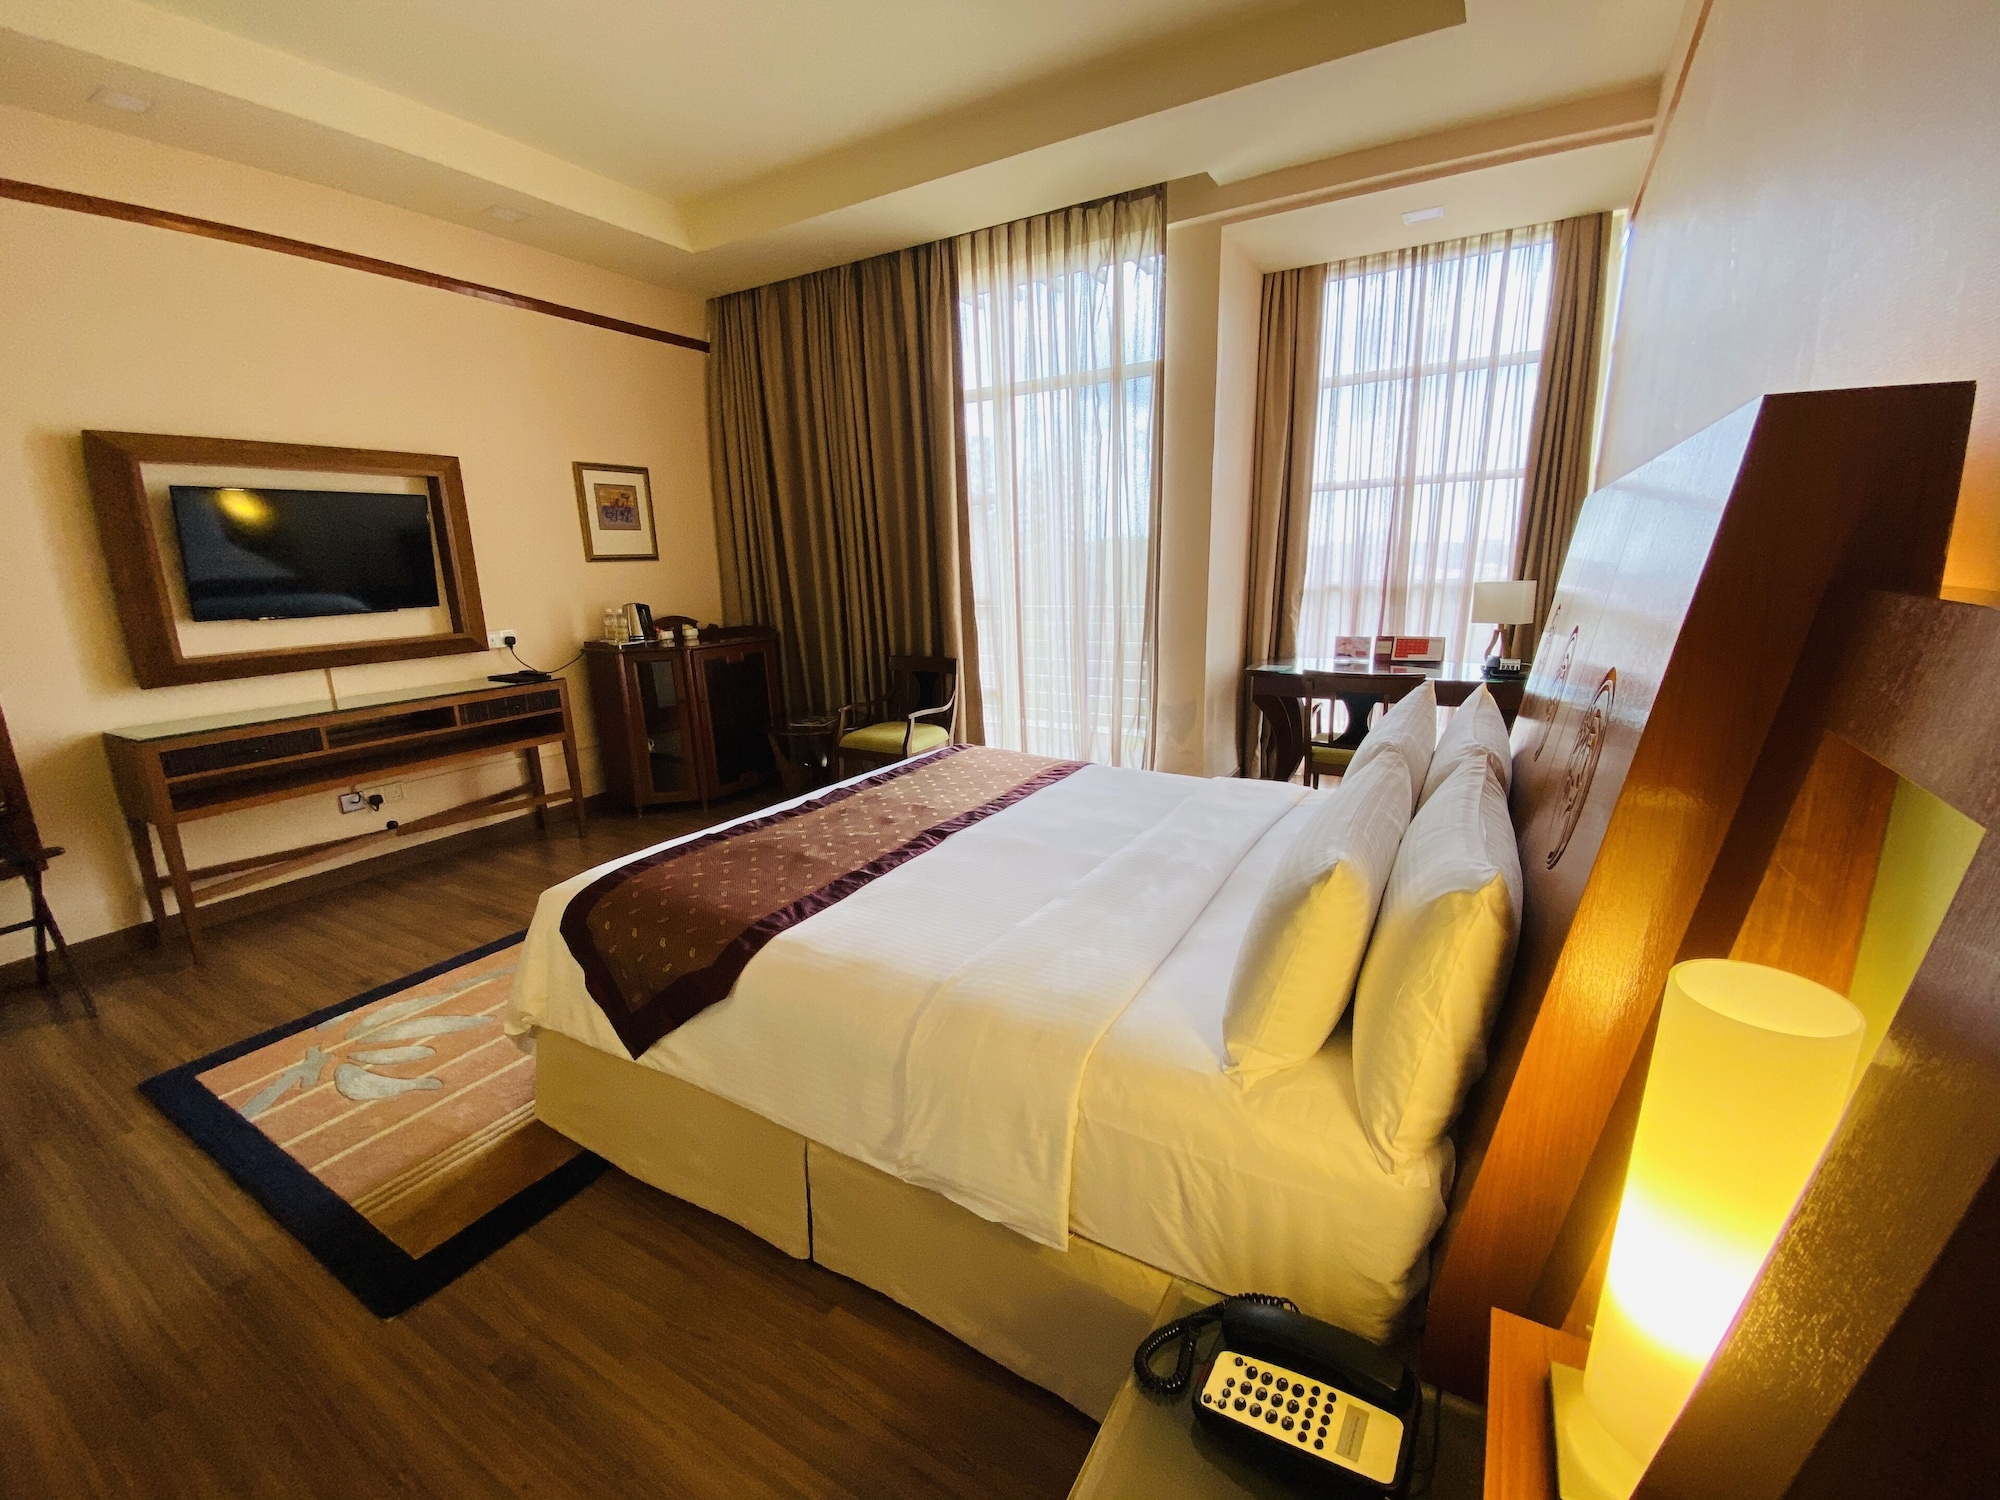 PULSE GRANDE Hotel (Formerly known as Putrajaya Shangri-La), Kuala Lumpur